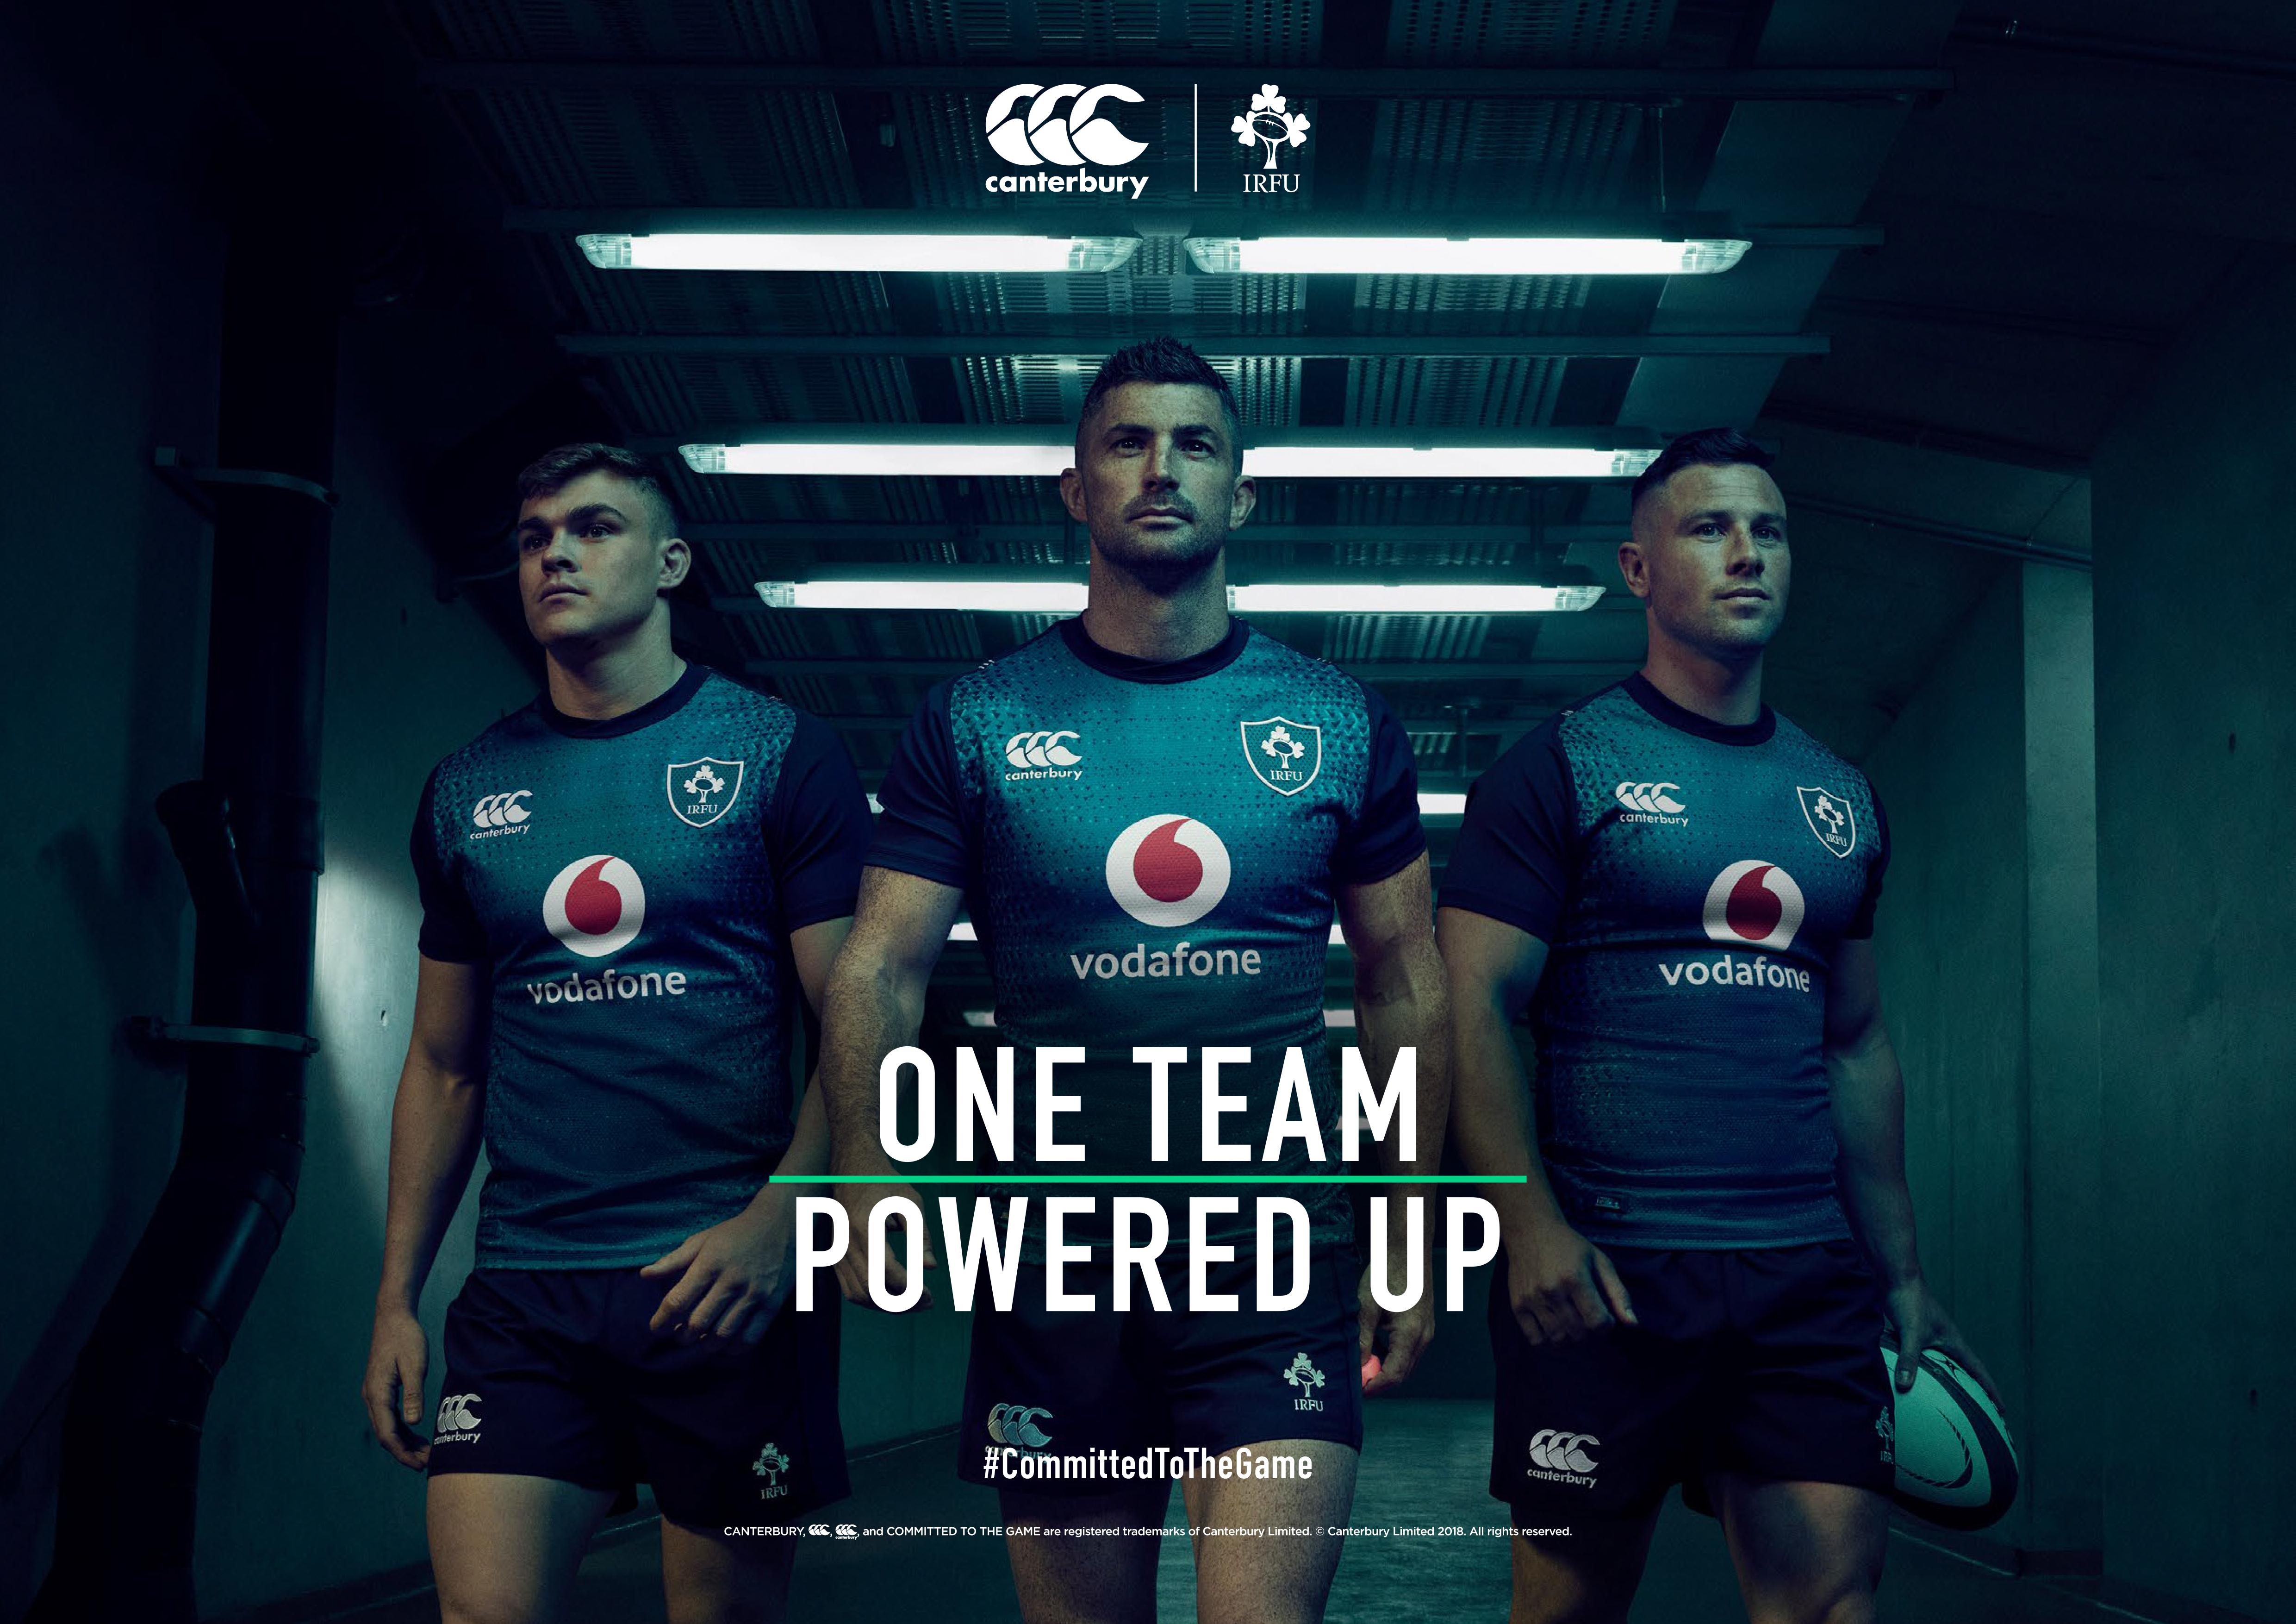 Neil Gavin Canterbury Ireland Rugby Shoot